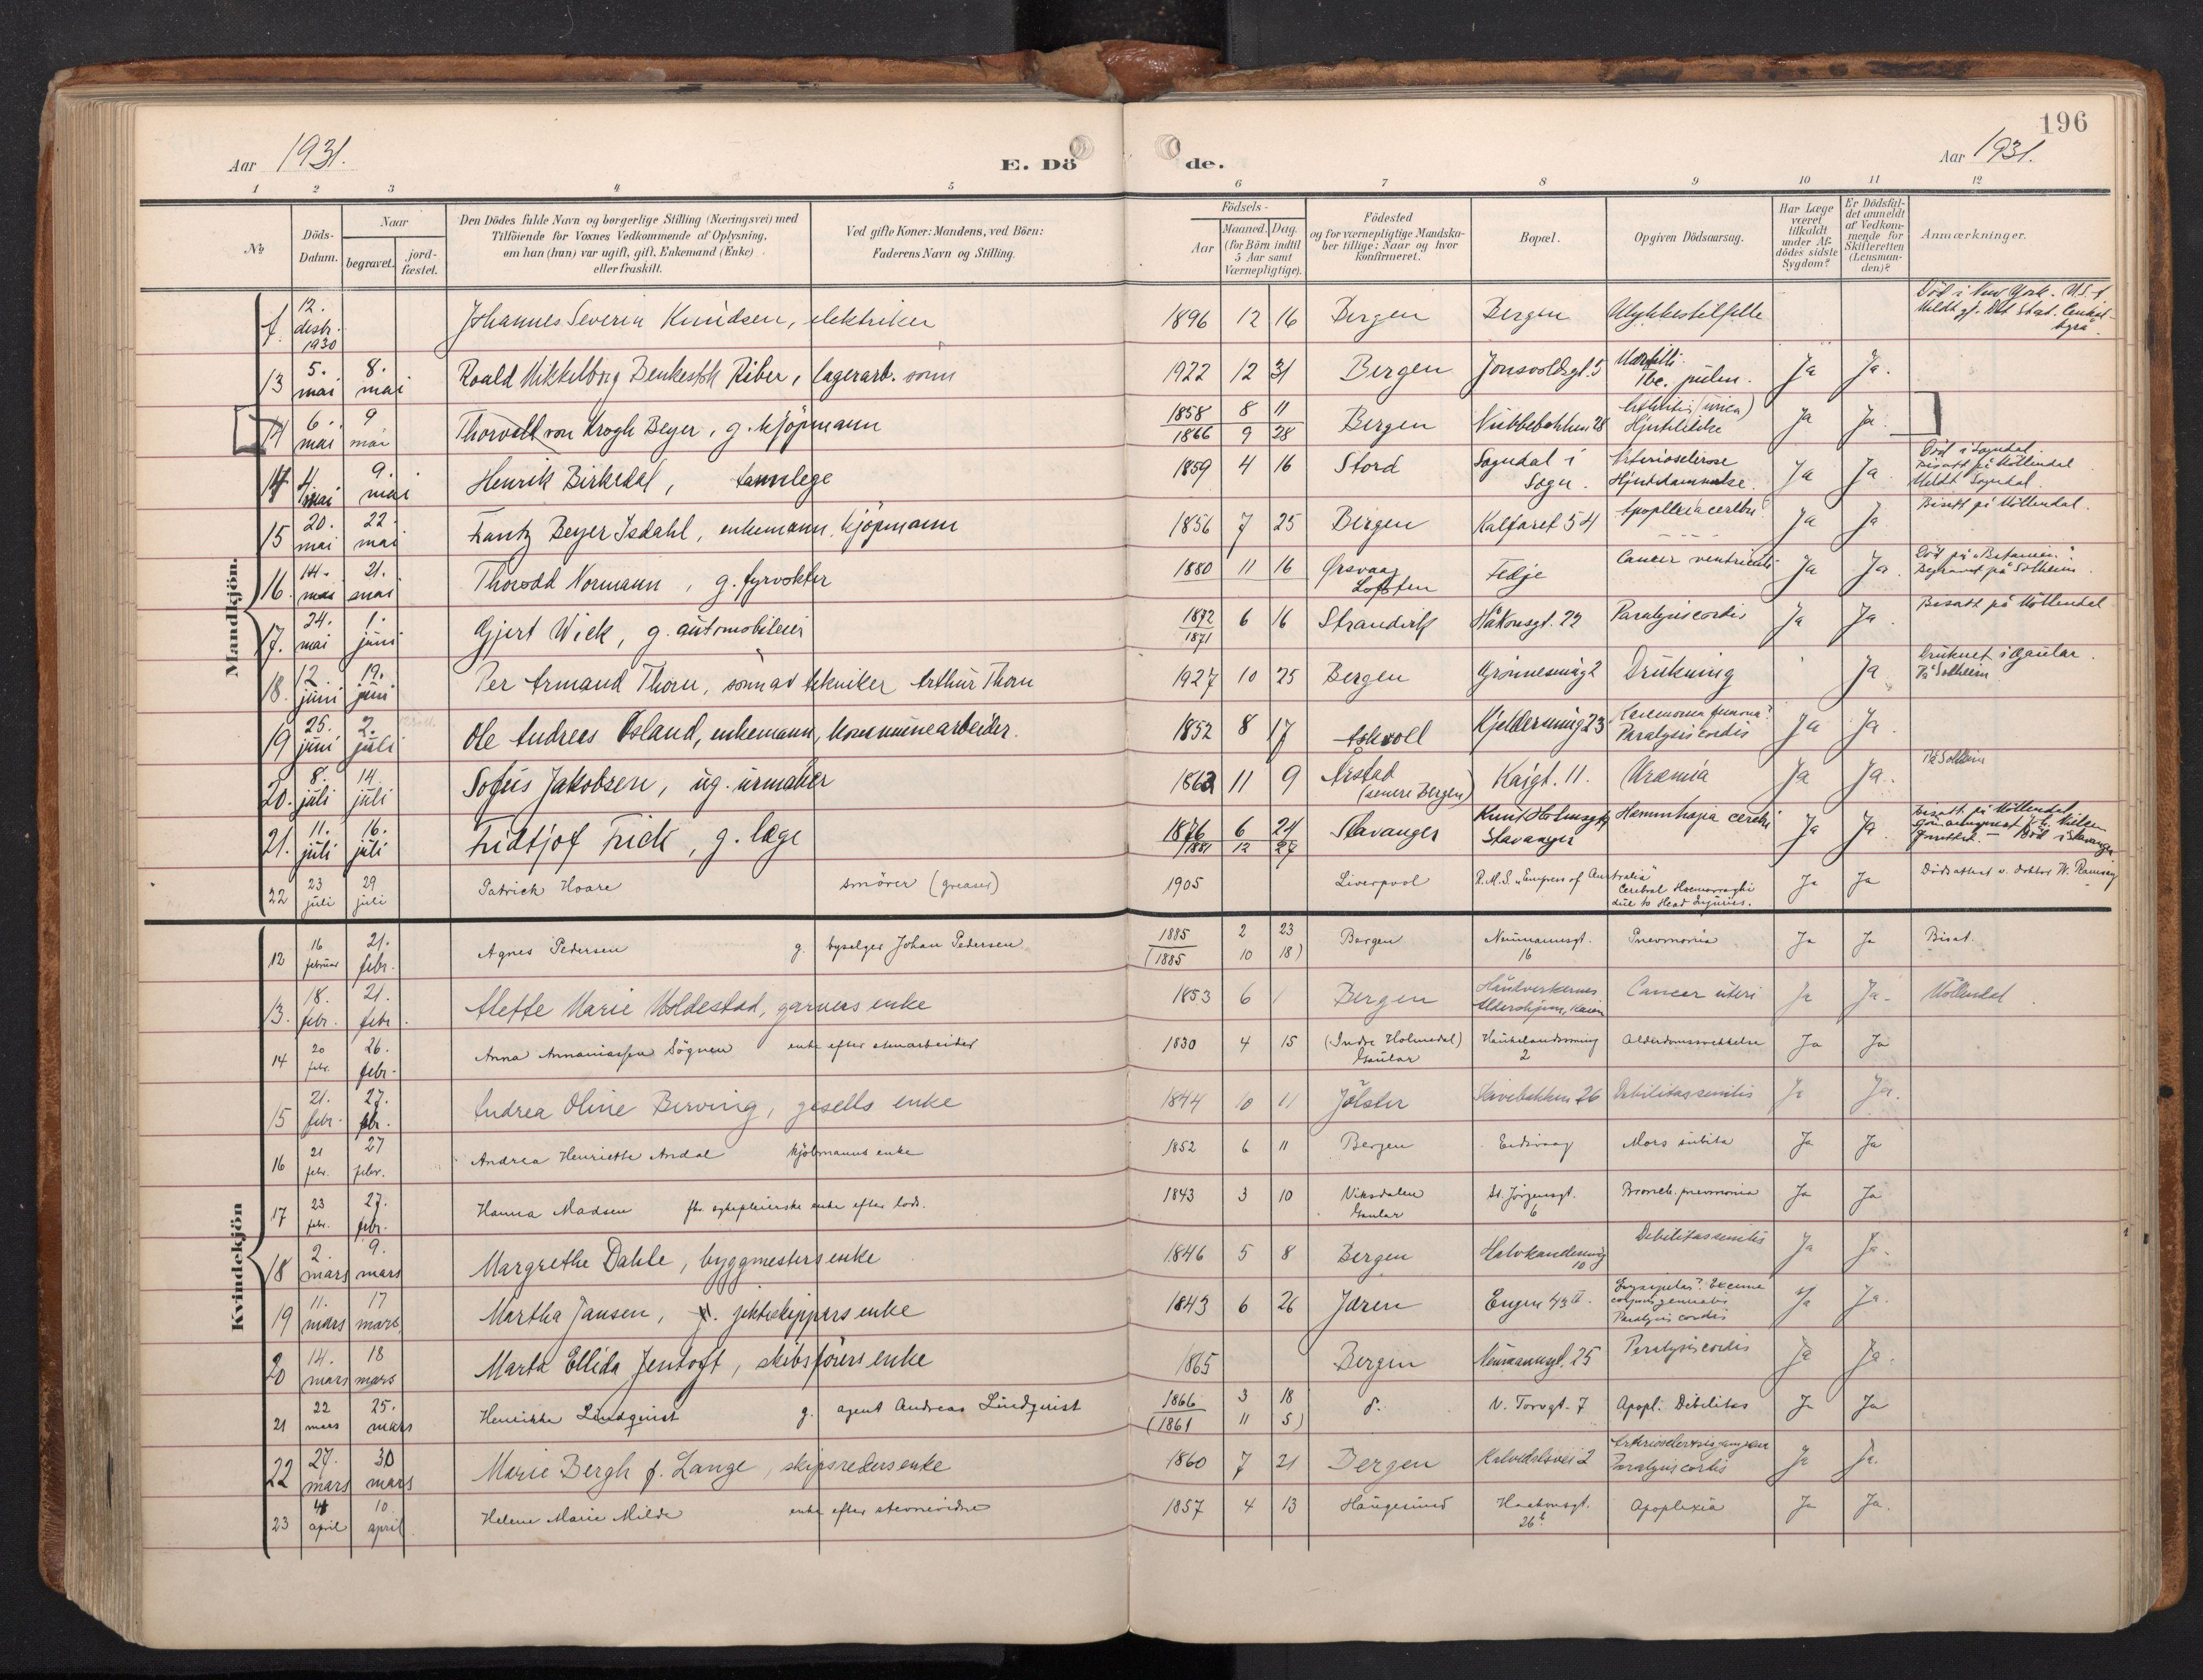 SAB, Domkirken Sokneprestembete, H/Haa/L0044: Ministerialbok nr. E 6, 1904-1946, s. 195b-196a